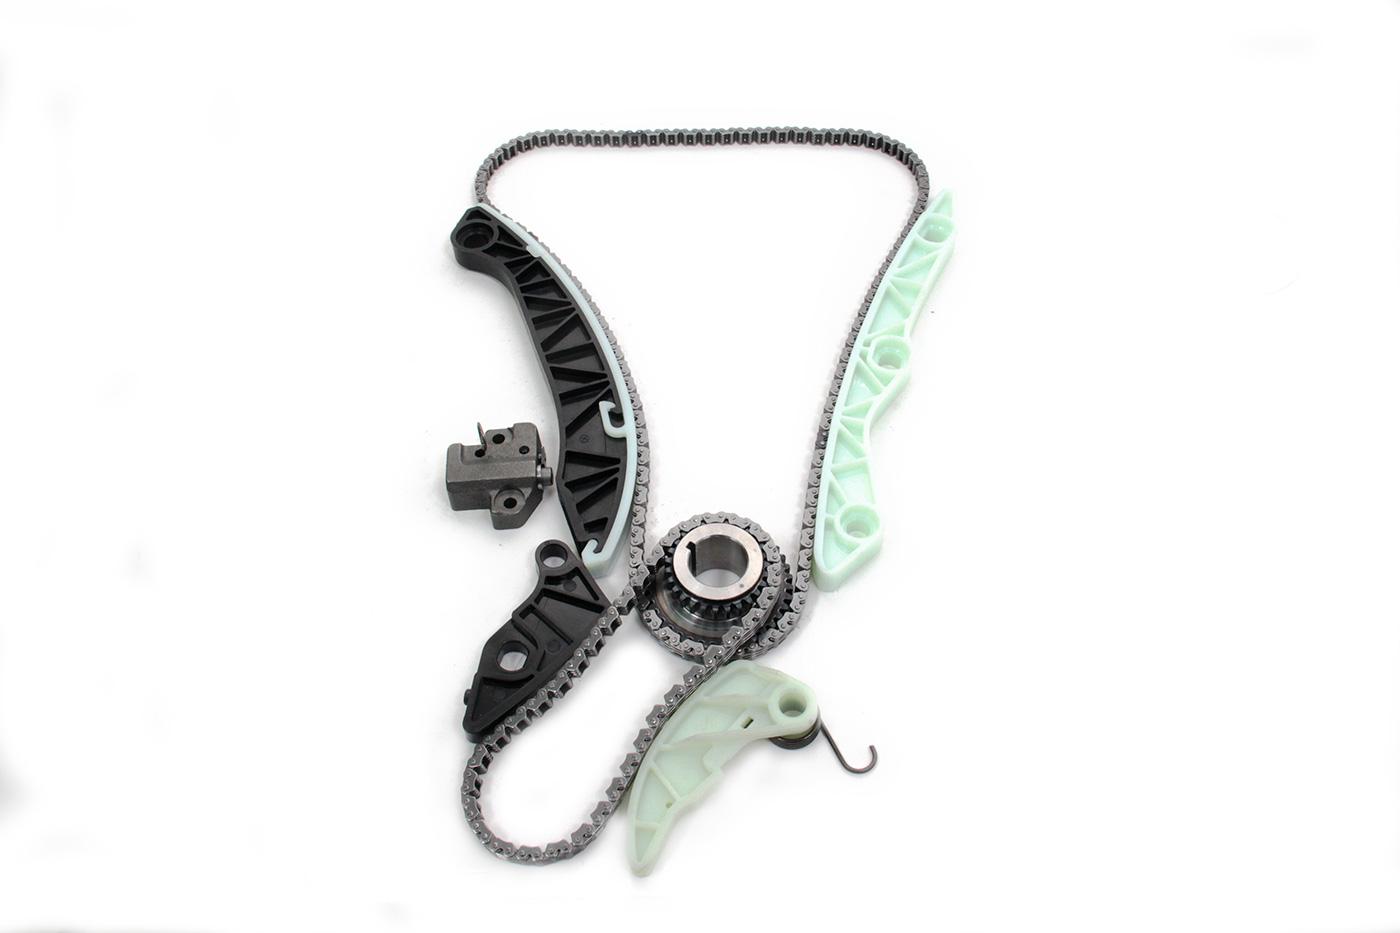 Timing Chain Kit Dodge Caliber 1 8lts Eba 4cyl 07 09